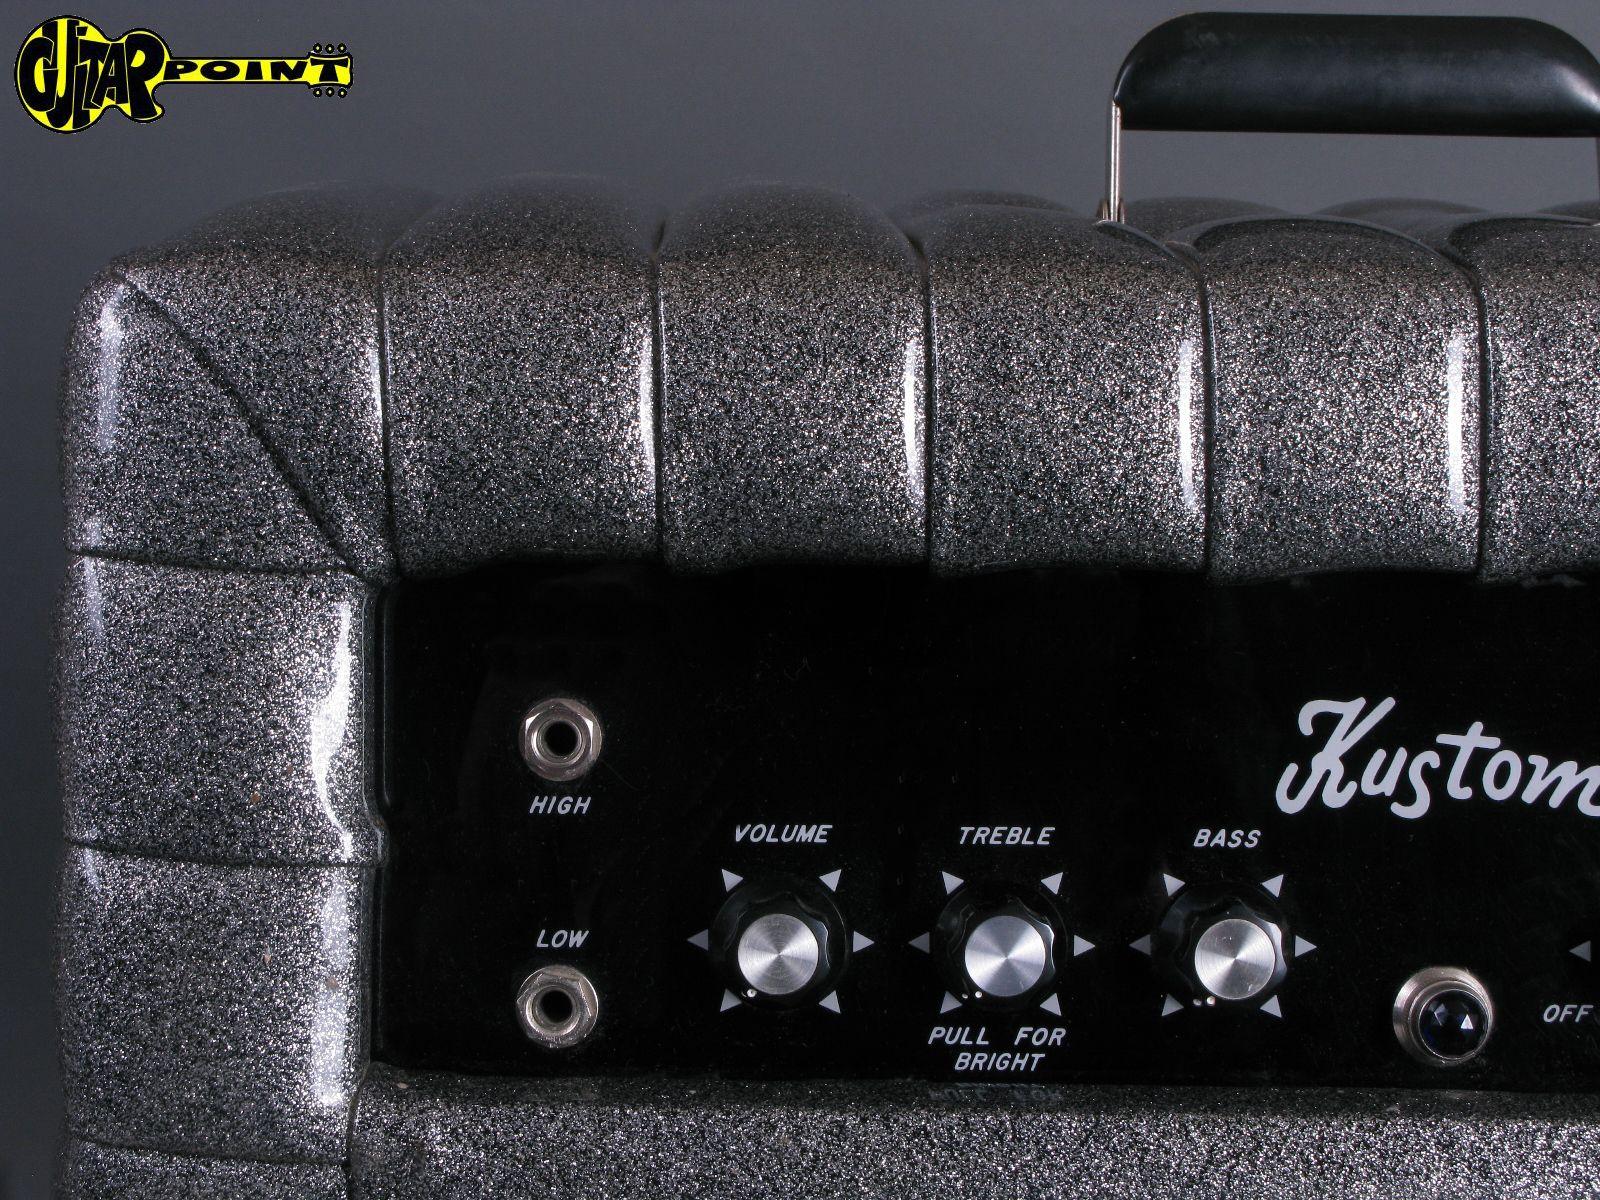 https://guitarpoint.de/app/uploads/products/1972-kustom-k25-c-2-tuck-roll-silver-sparkle/Kustom68K25_2Silver_32.jpg